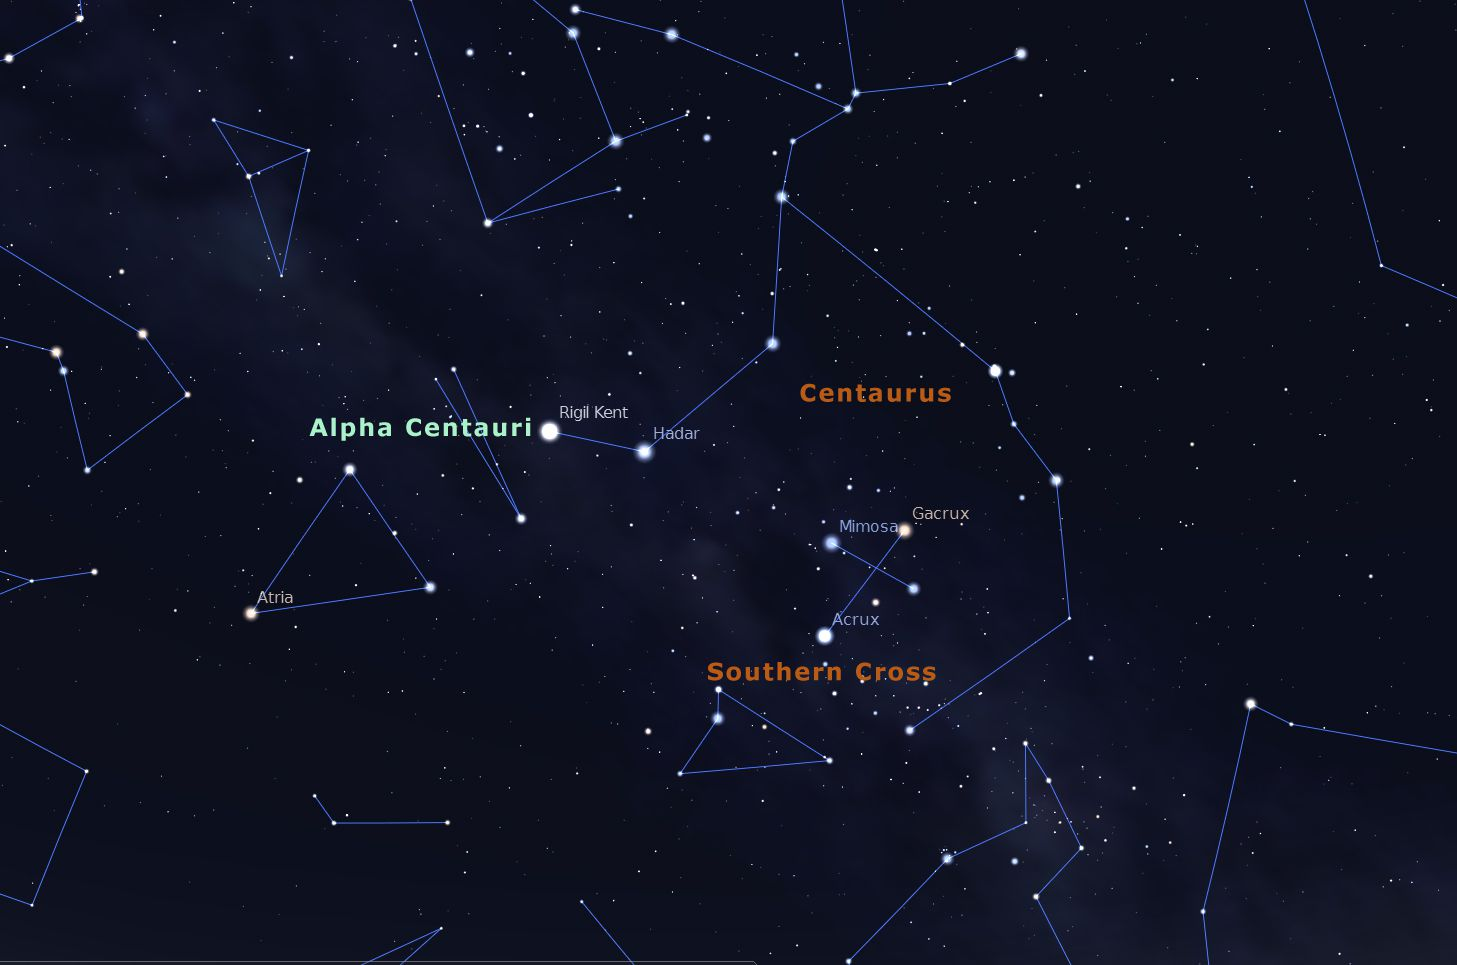 Star chart of Alpha Centauri